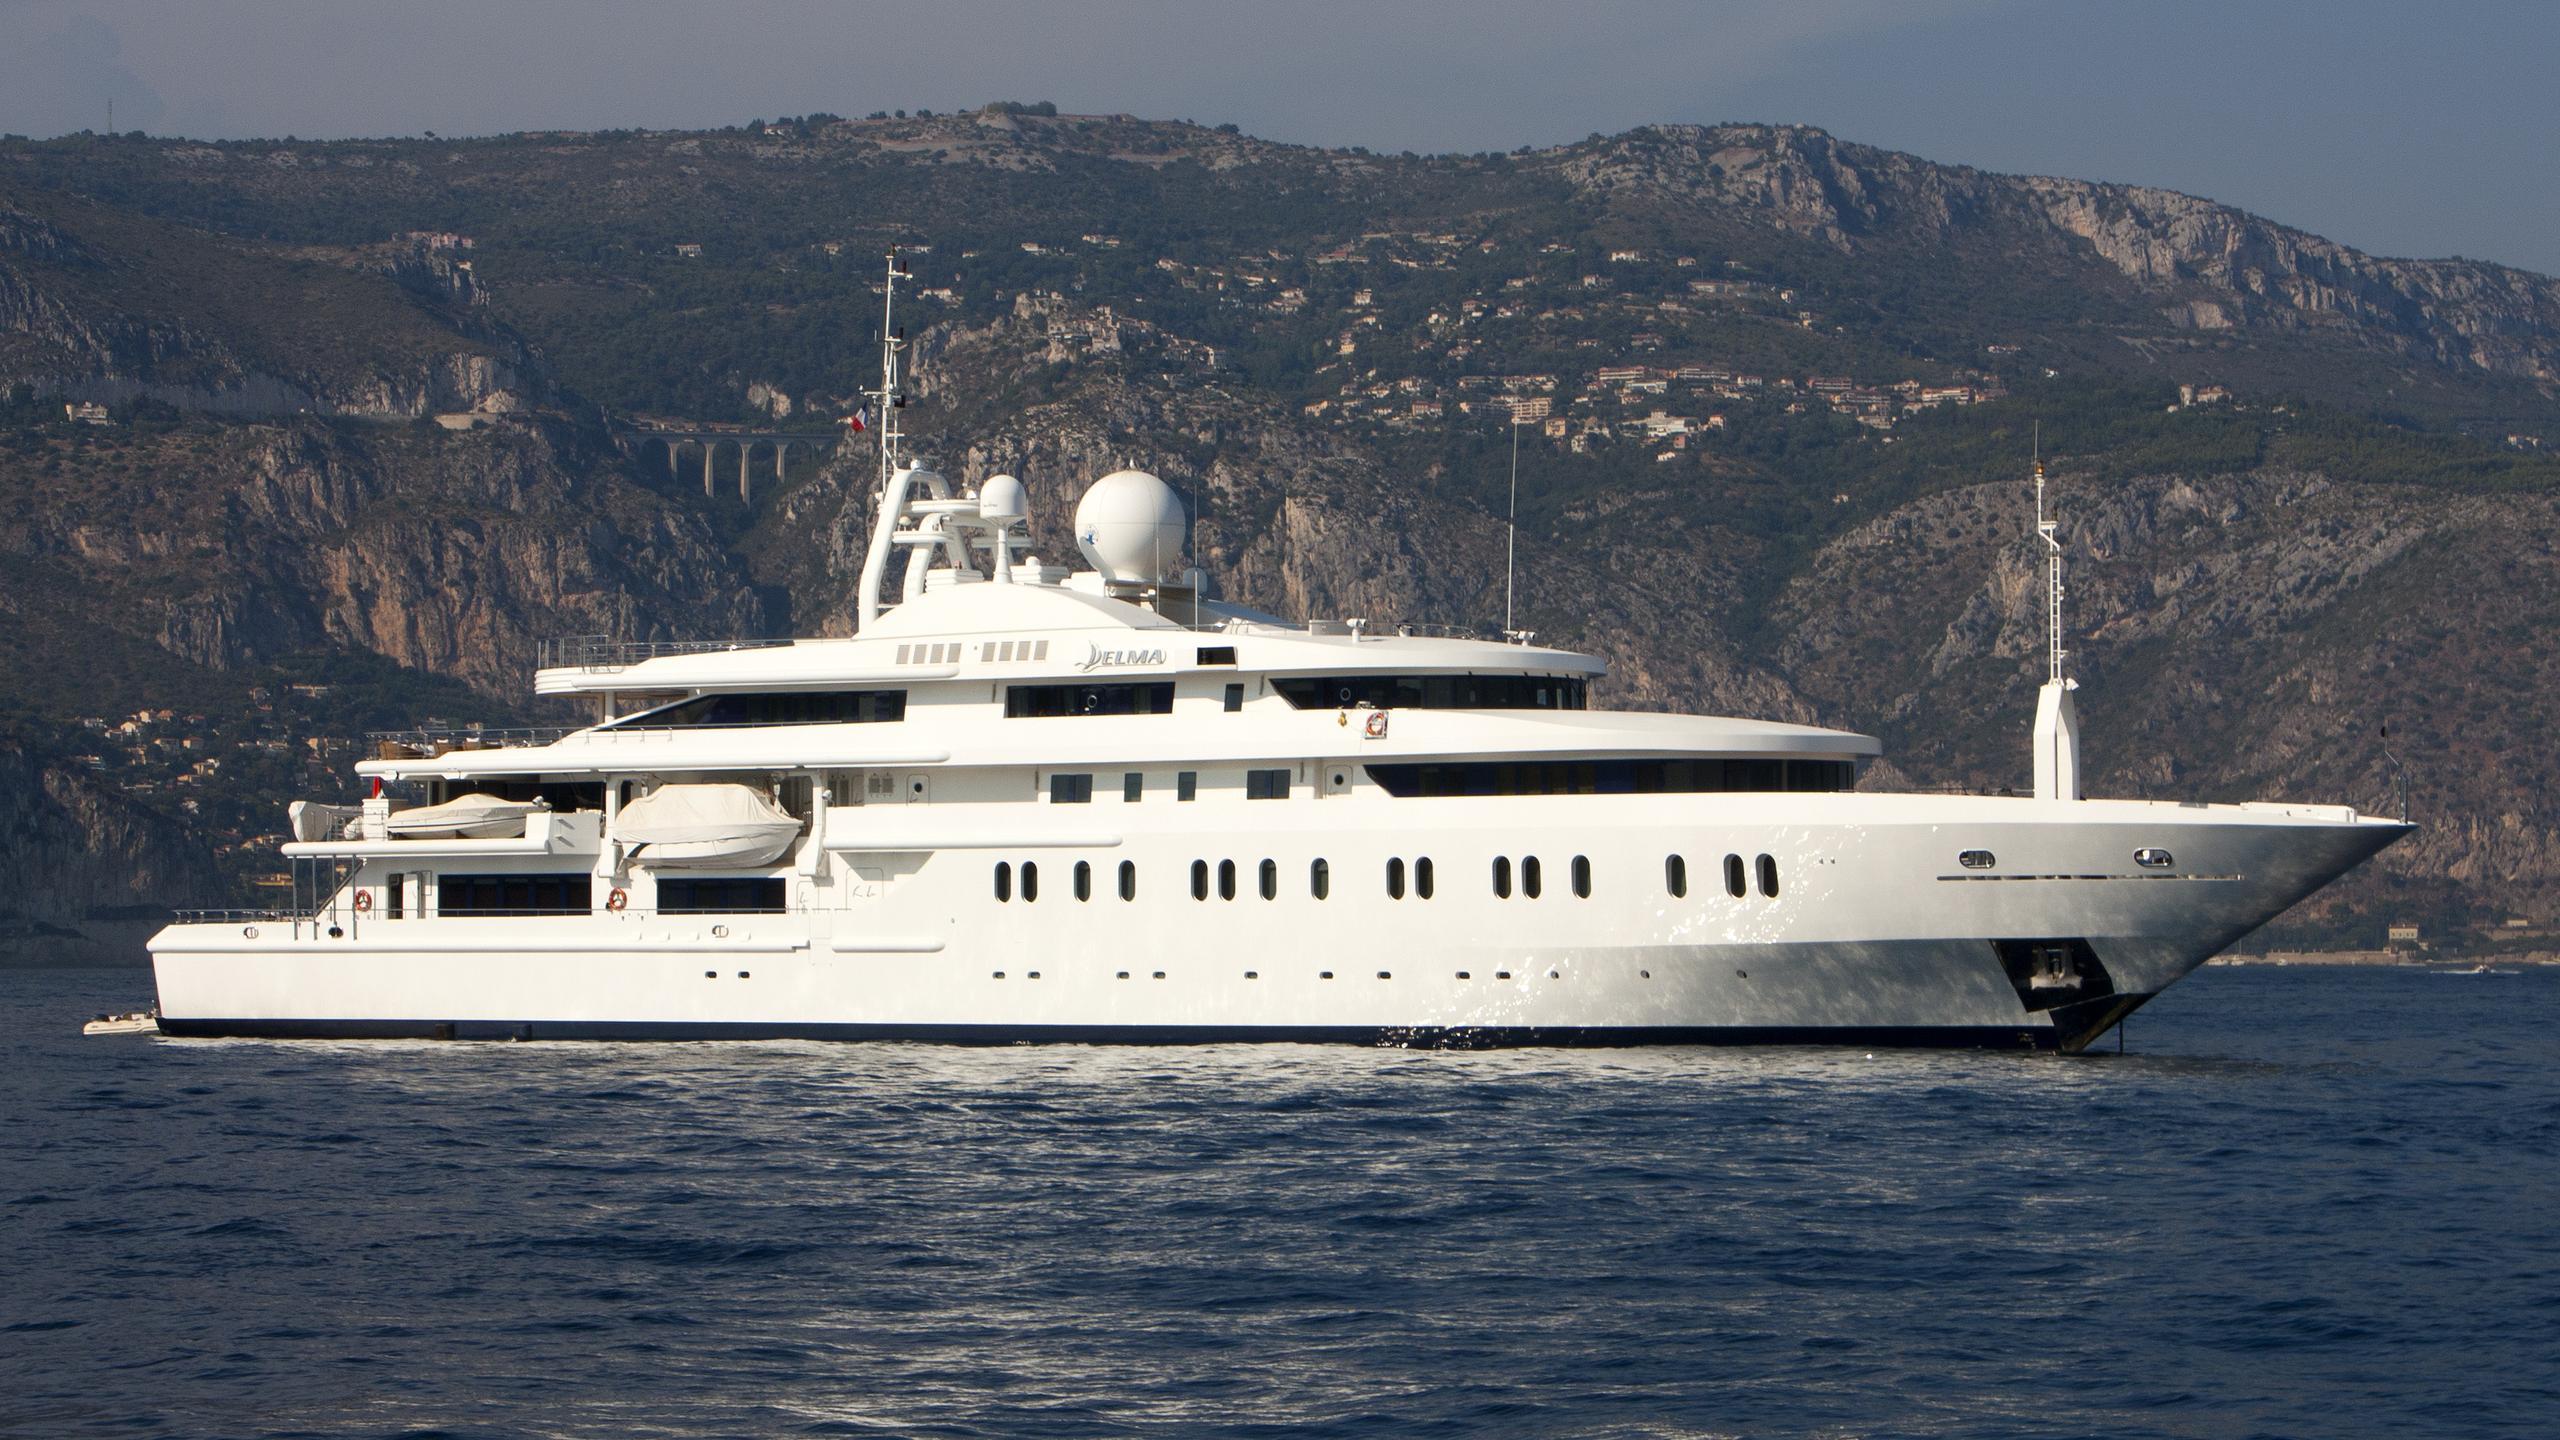 queen-miri-motor-yacht-neorion-2004-91m-half-profile-before-refit